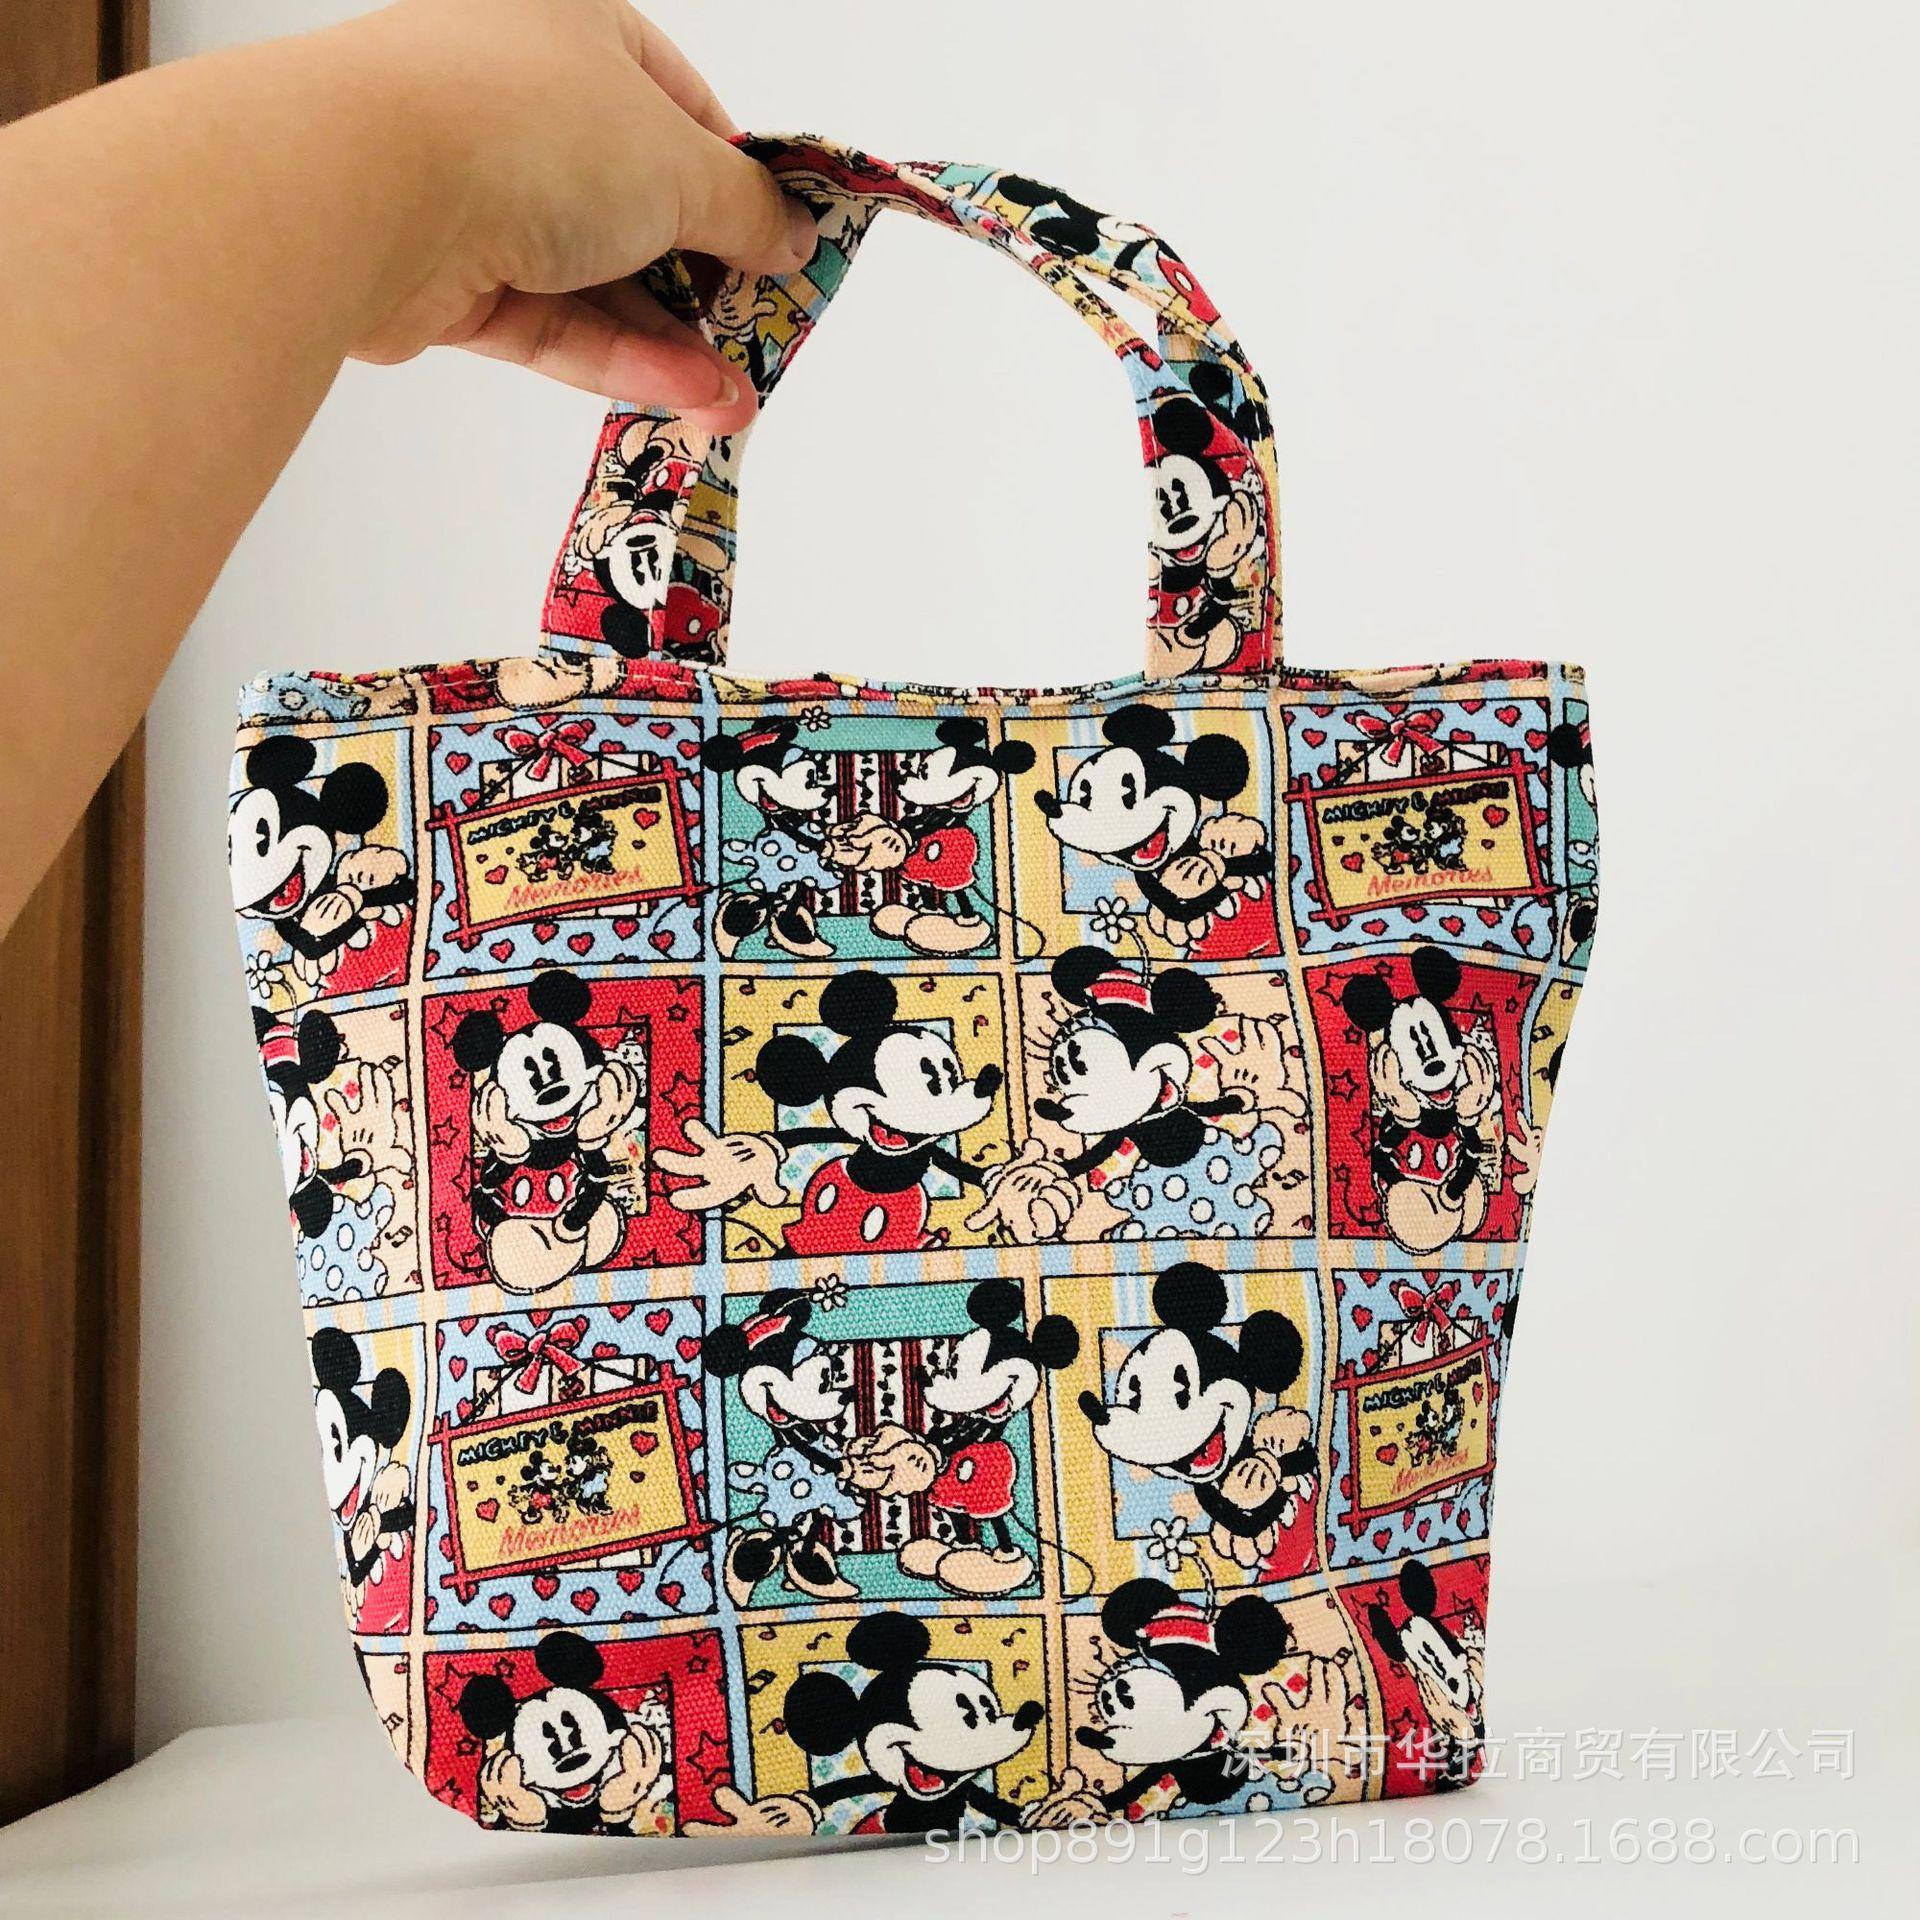 Disney Summer Portable Canvas Bag Ladies Cloth Bag Cartoon Mickey Mouse Minnie Bag Student Tool Sundries Bag Totes Hand Bag L